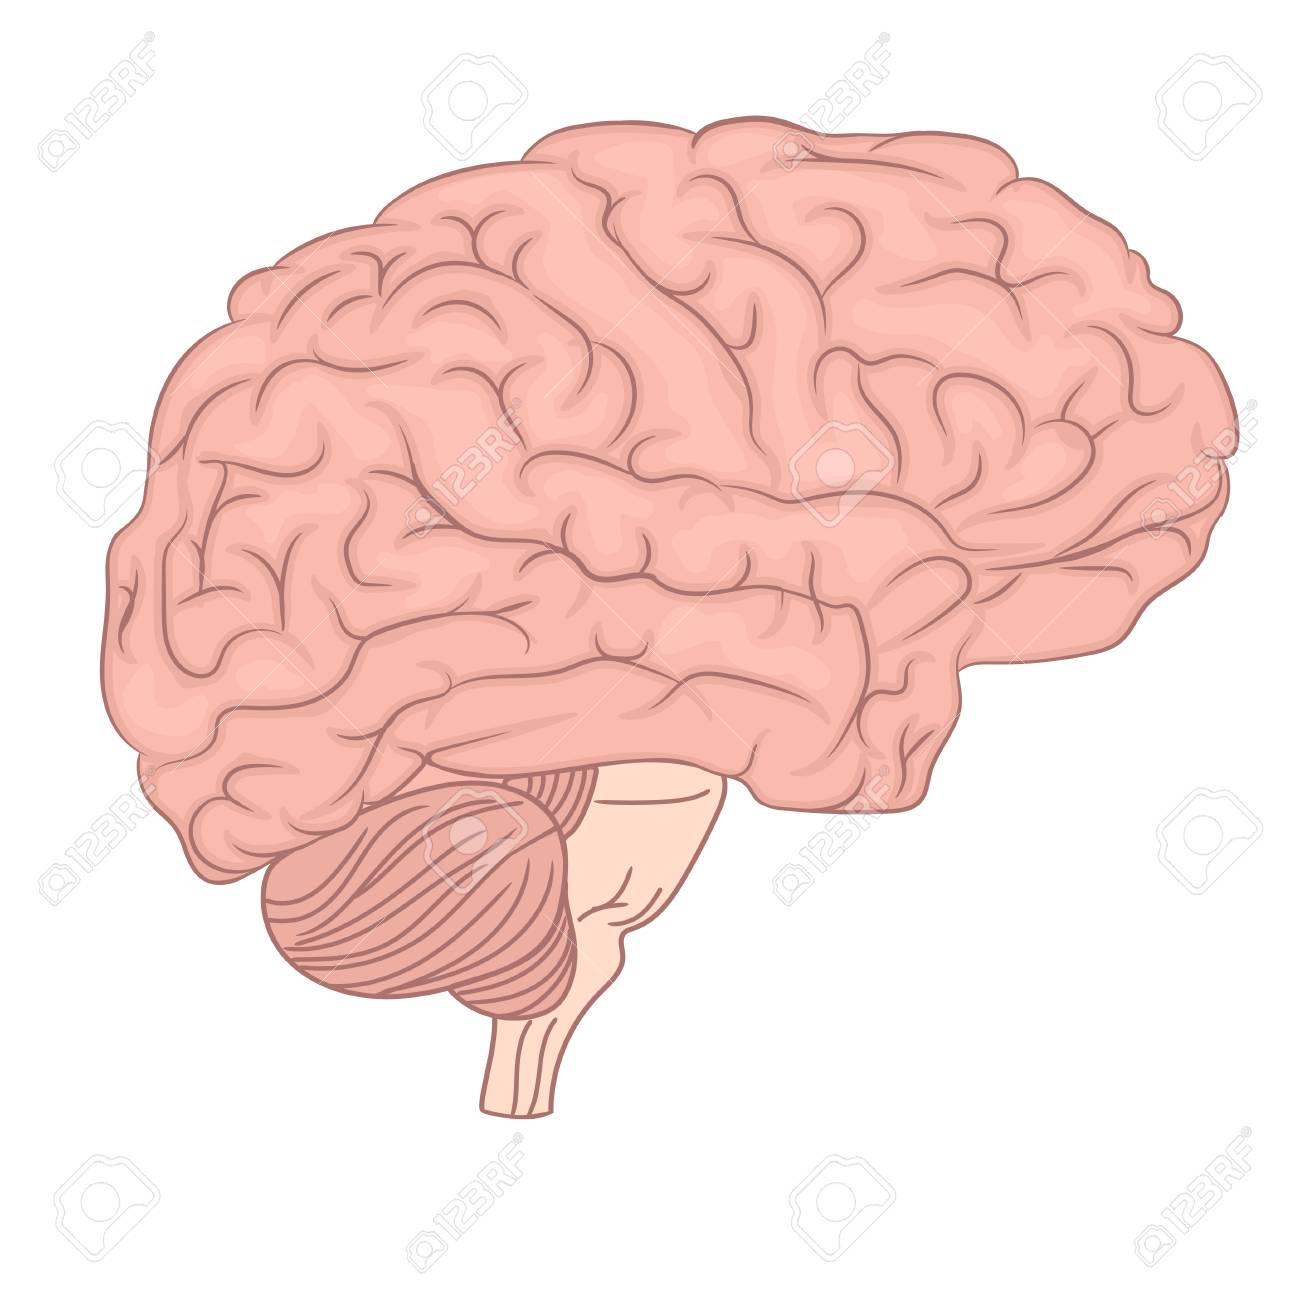 Human Brain Organ Anatomy Diagram Lateral View Colorful Design